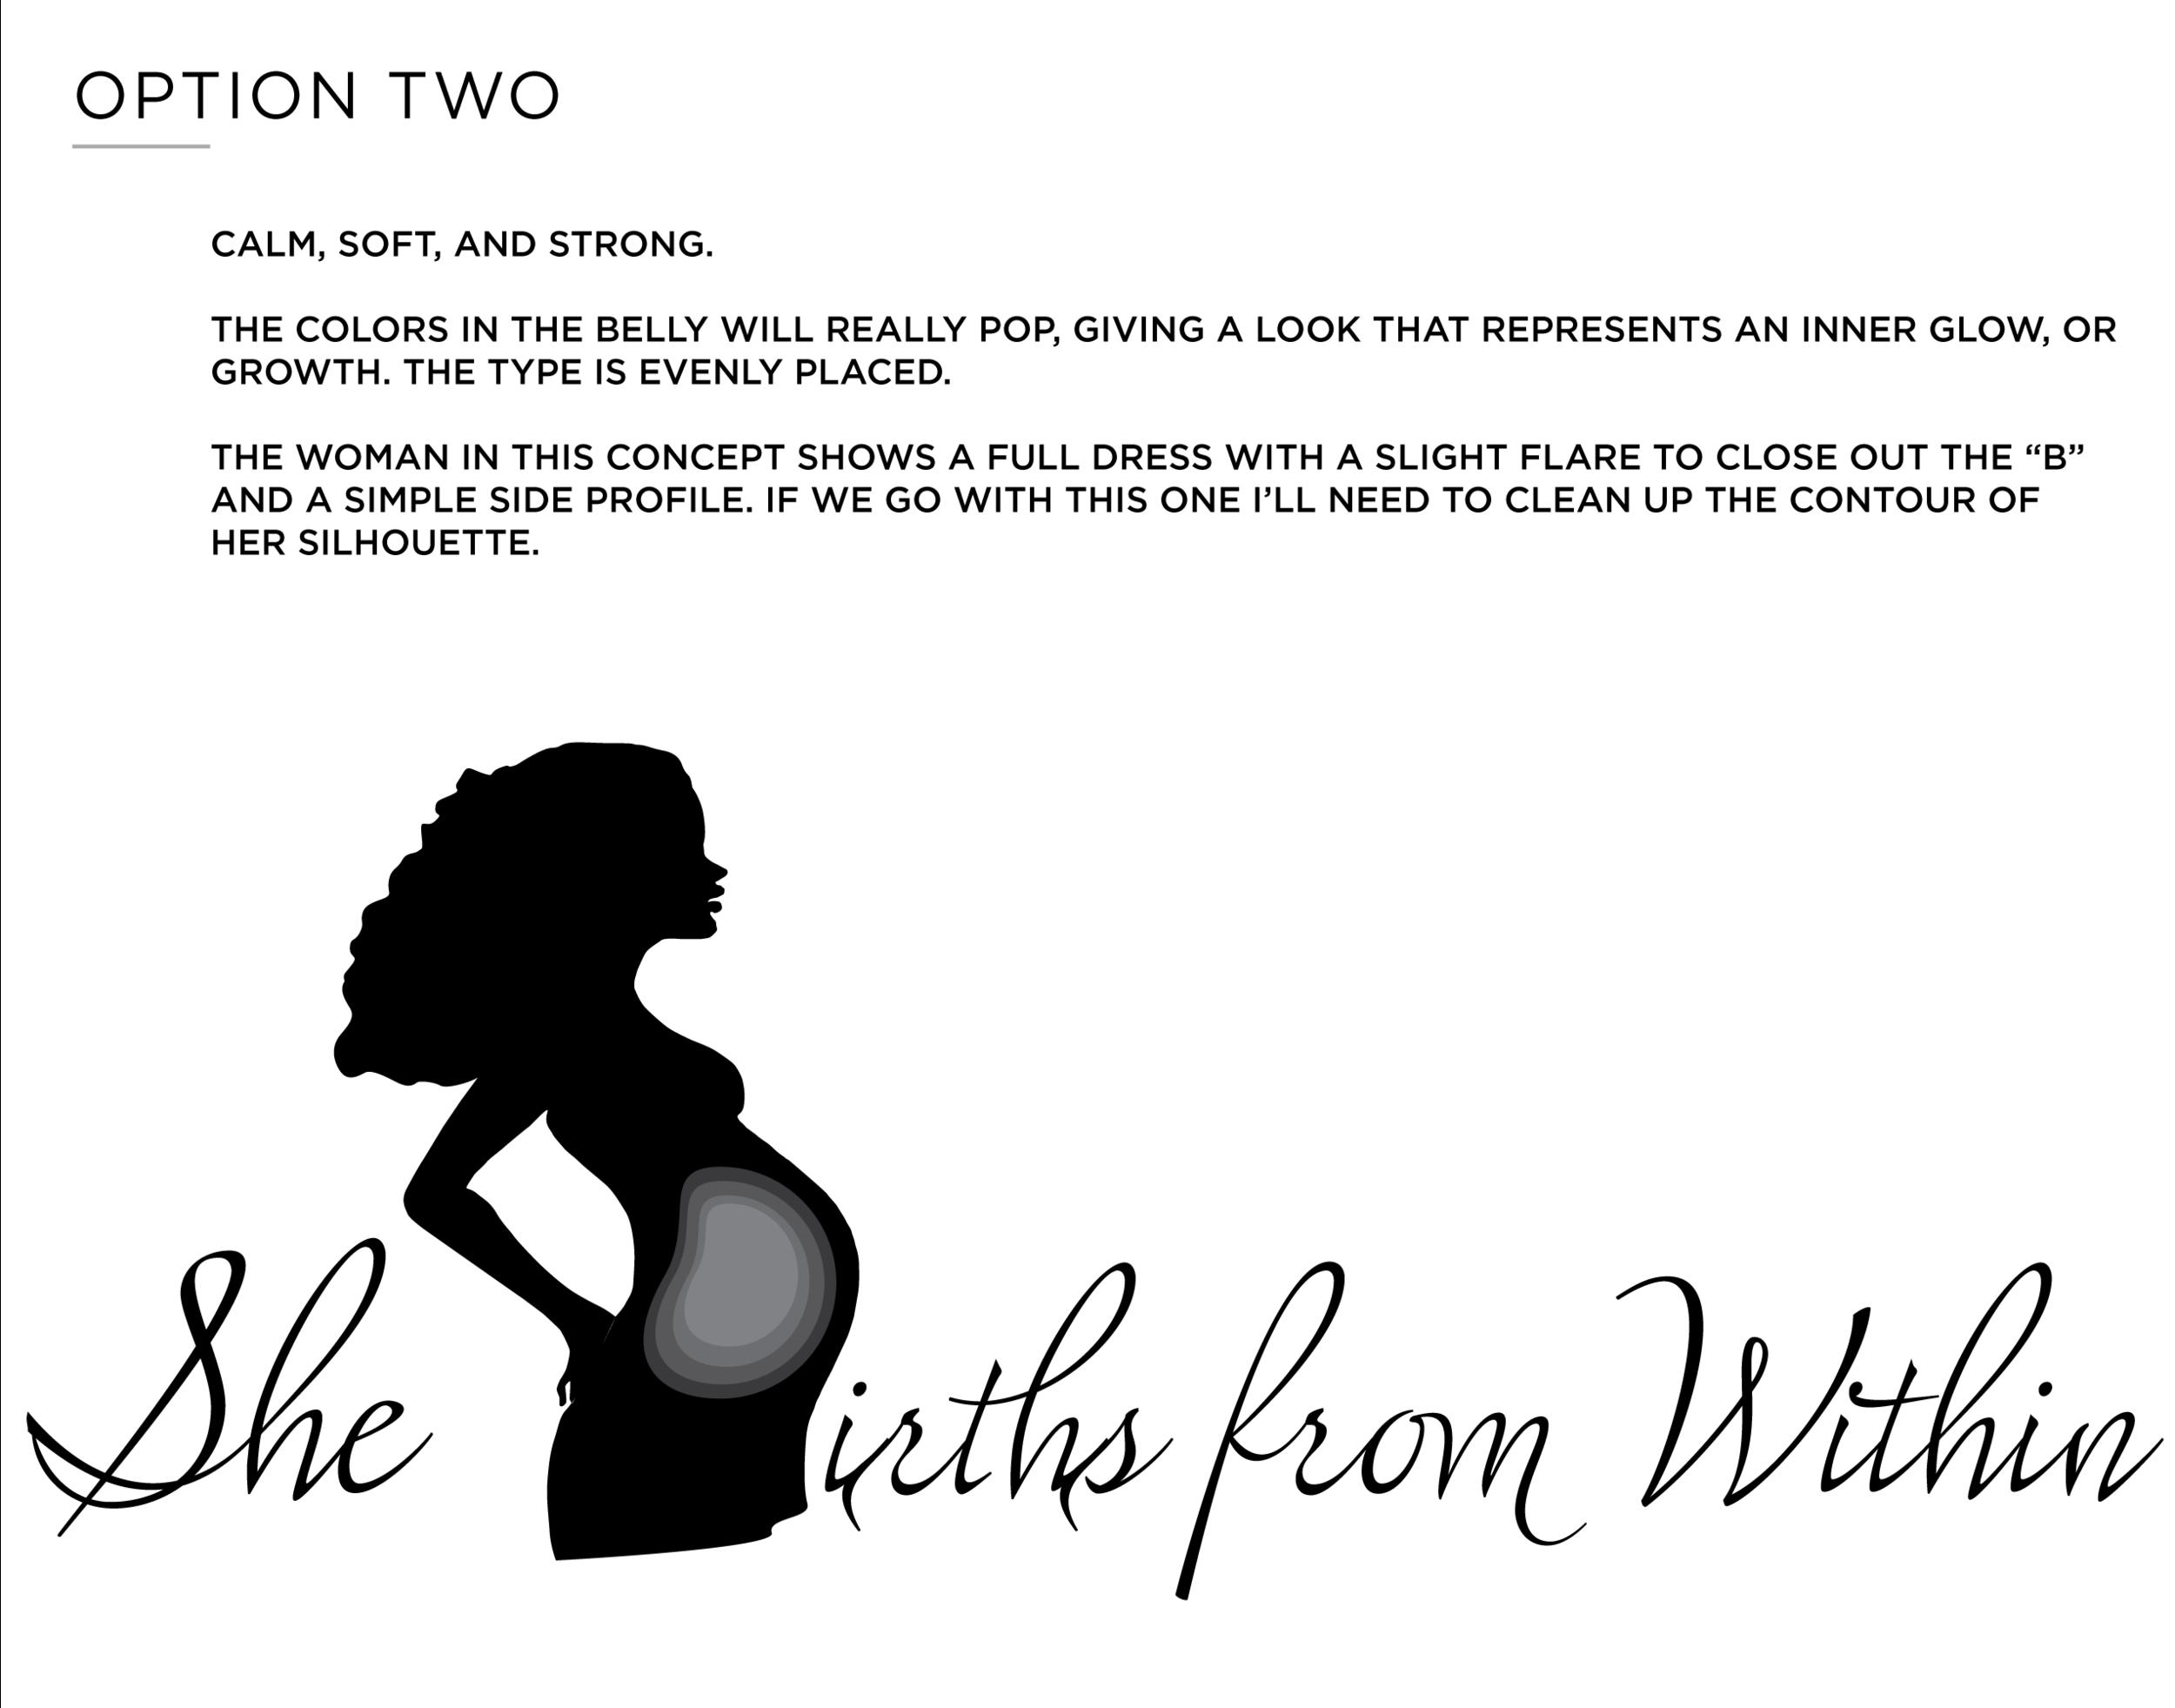 logo concepts-1_Option 2.png